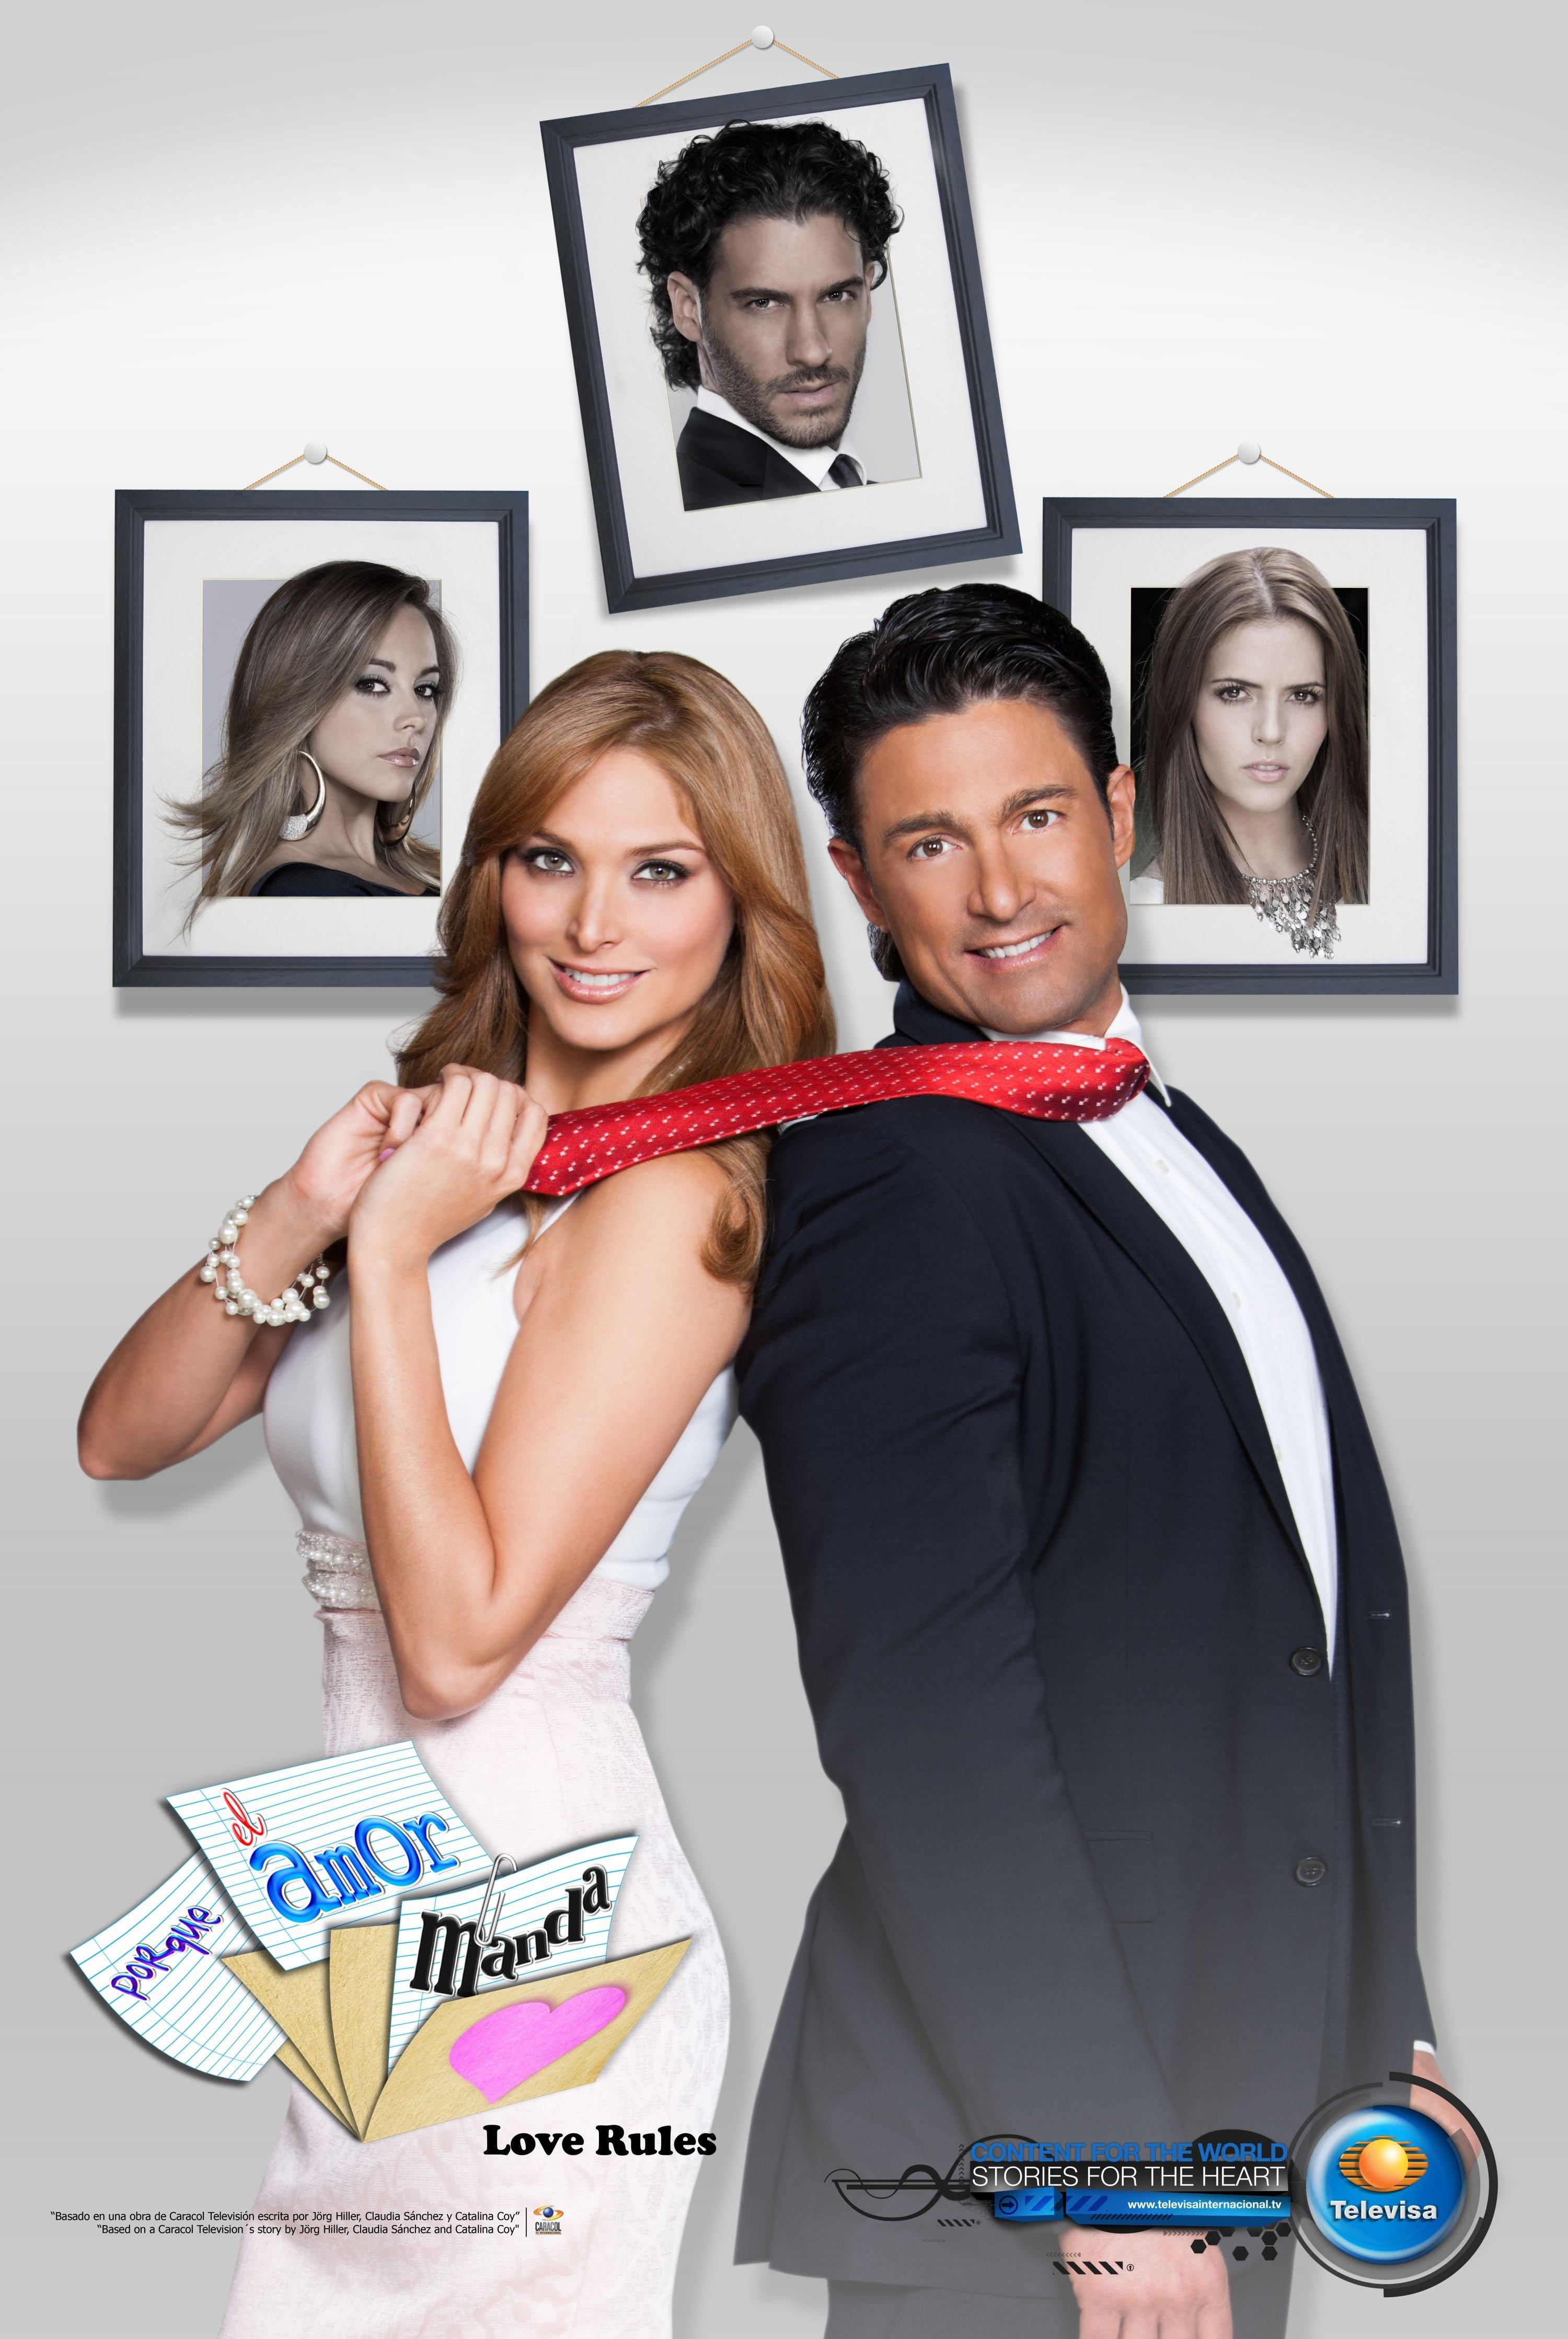 Image result for porque el amor manda poster